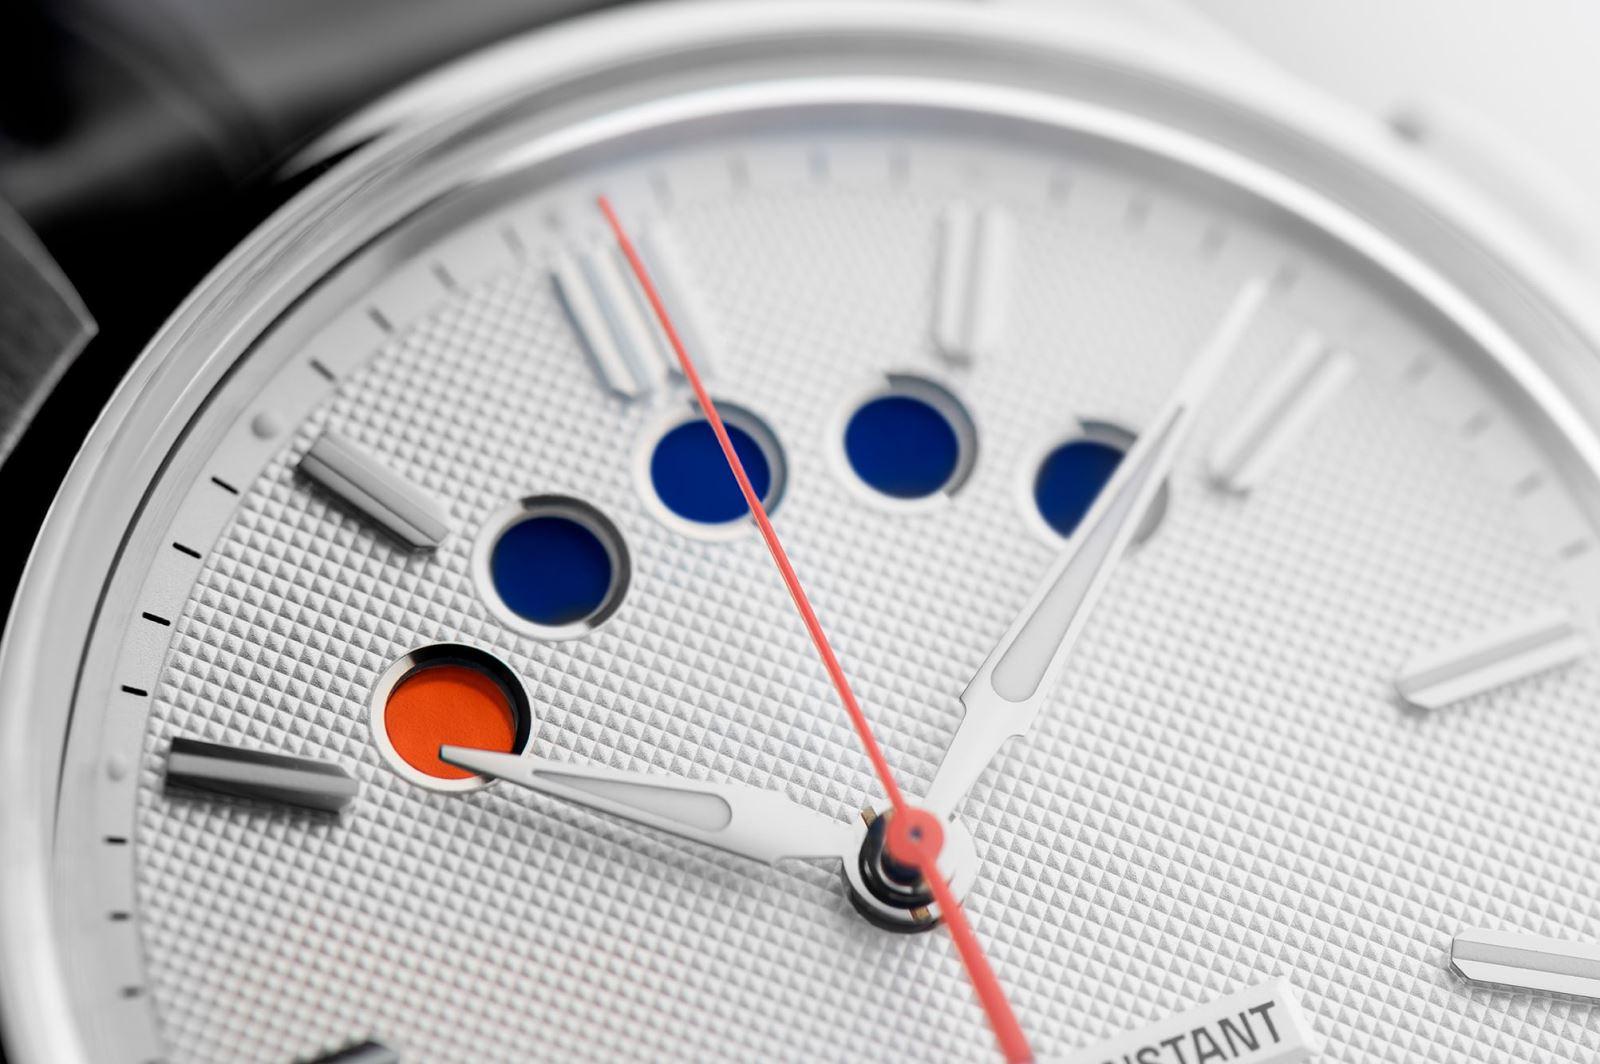 FREDERIQUE CONSTANT YACHT TIMER REGATTA COUNTDOWN  đồng hồ bấm giờ đếm ngược